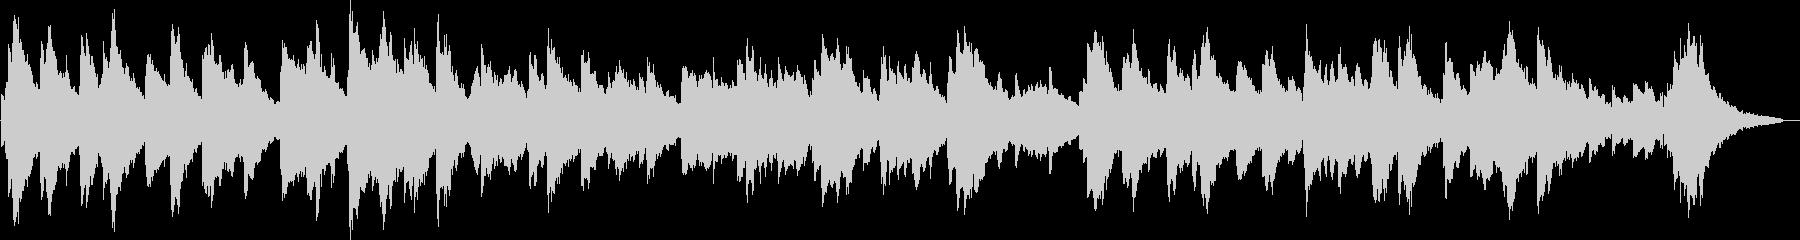 Sleepy Rhose 1の未再生の波形